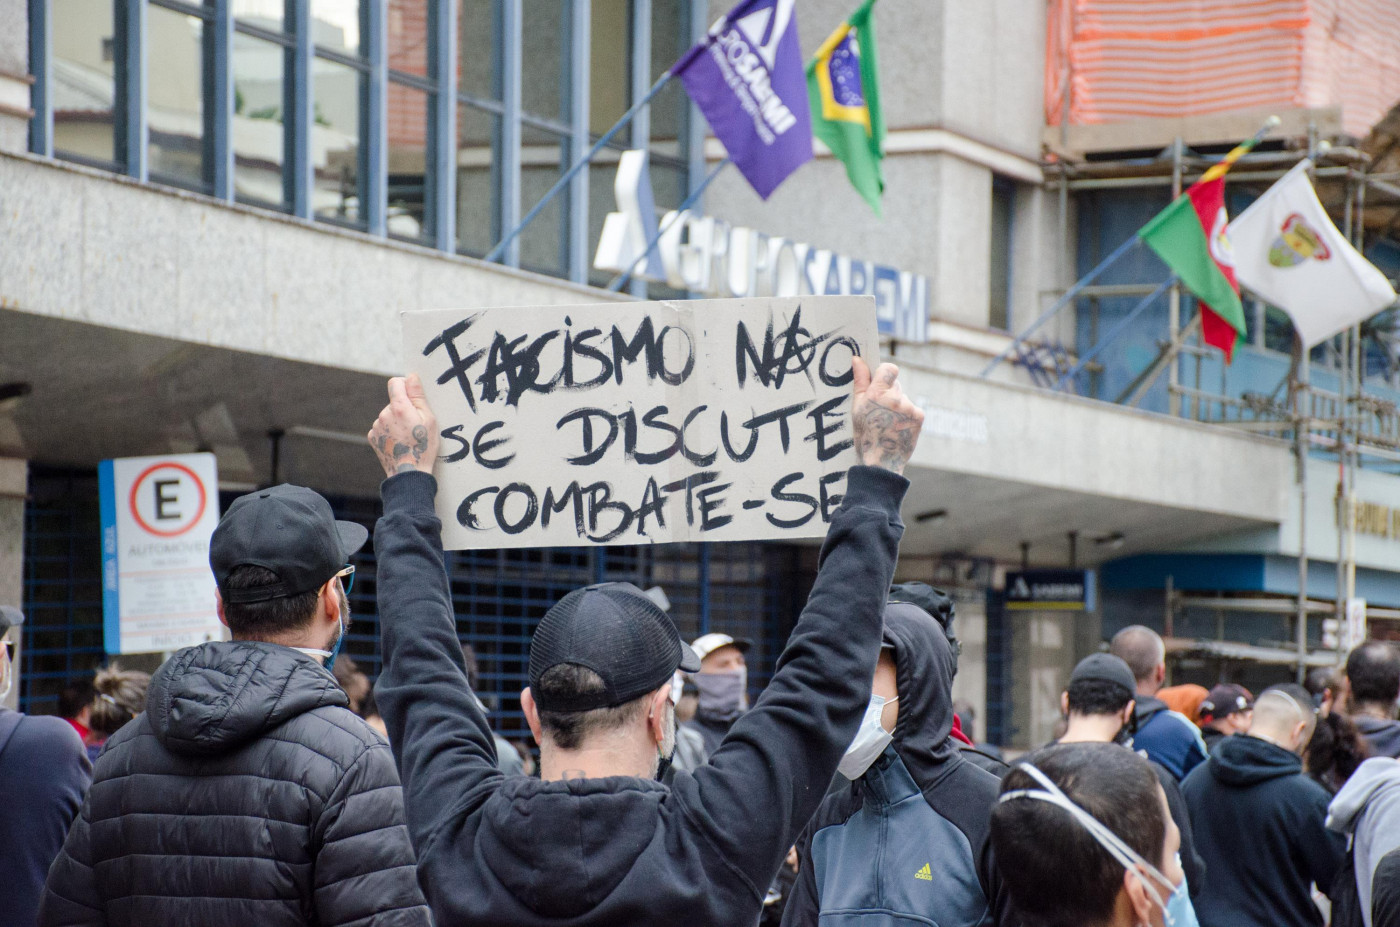 manifestação, são paulo